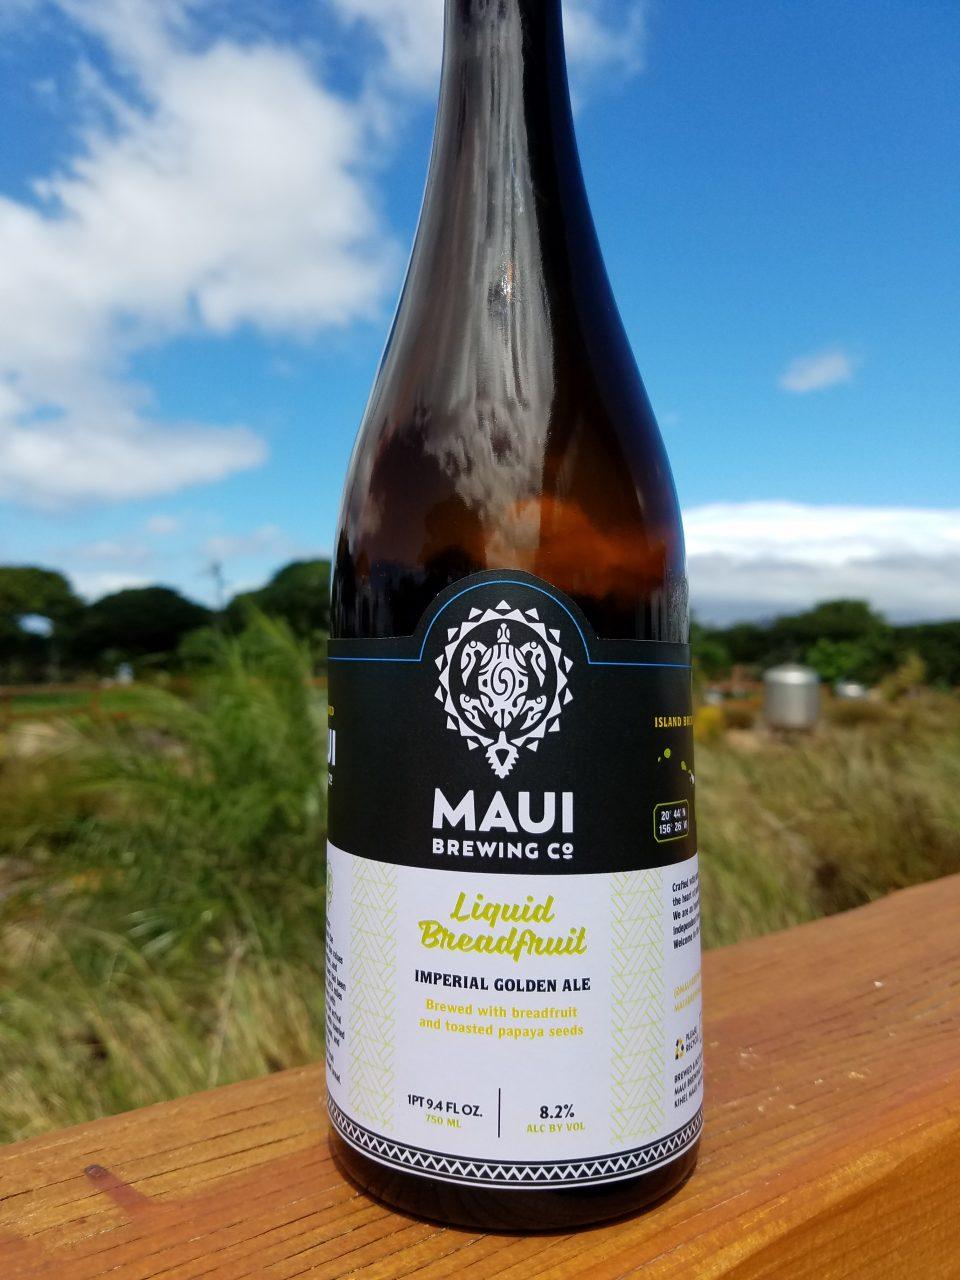 Maui Liquid Breadfruit